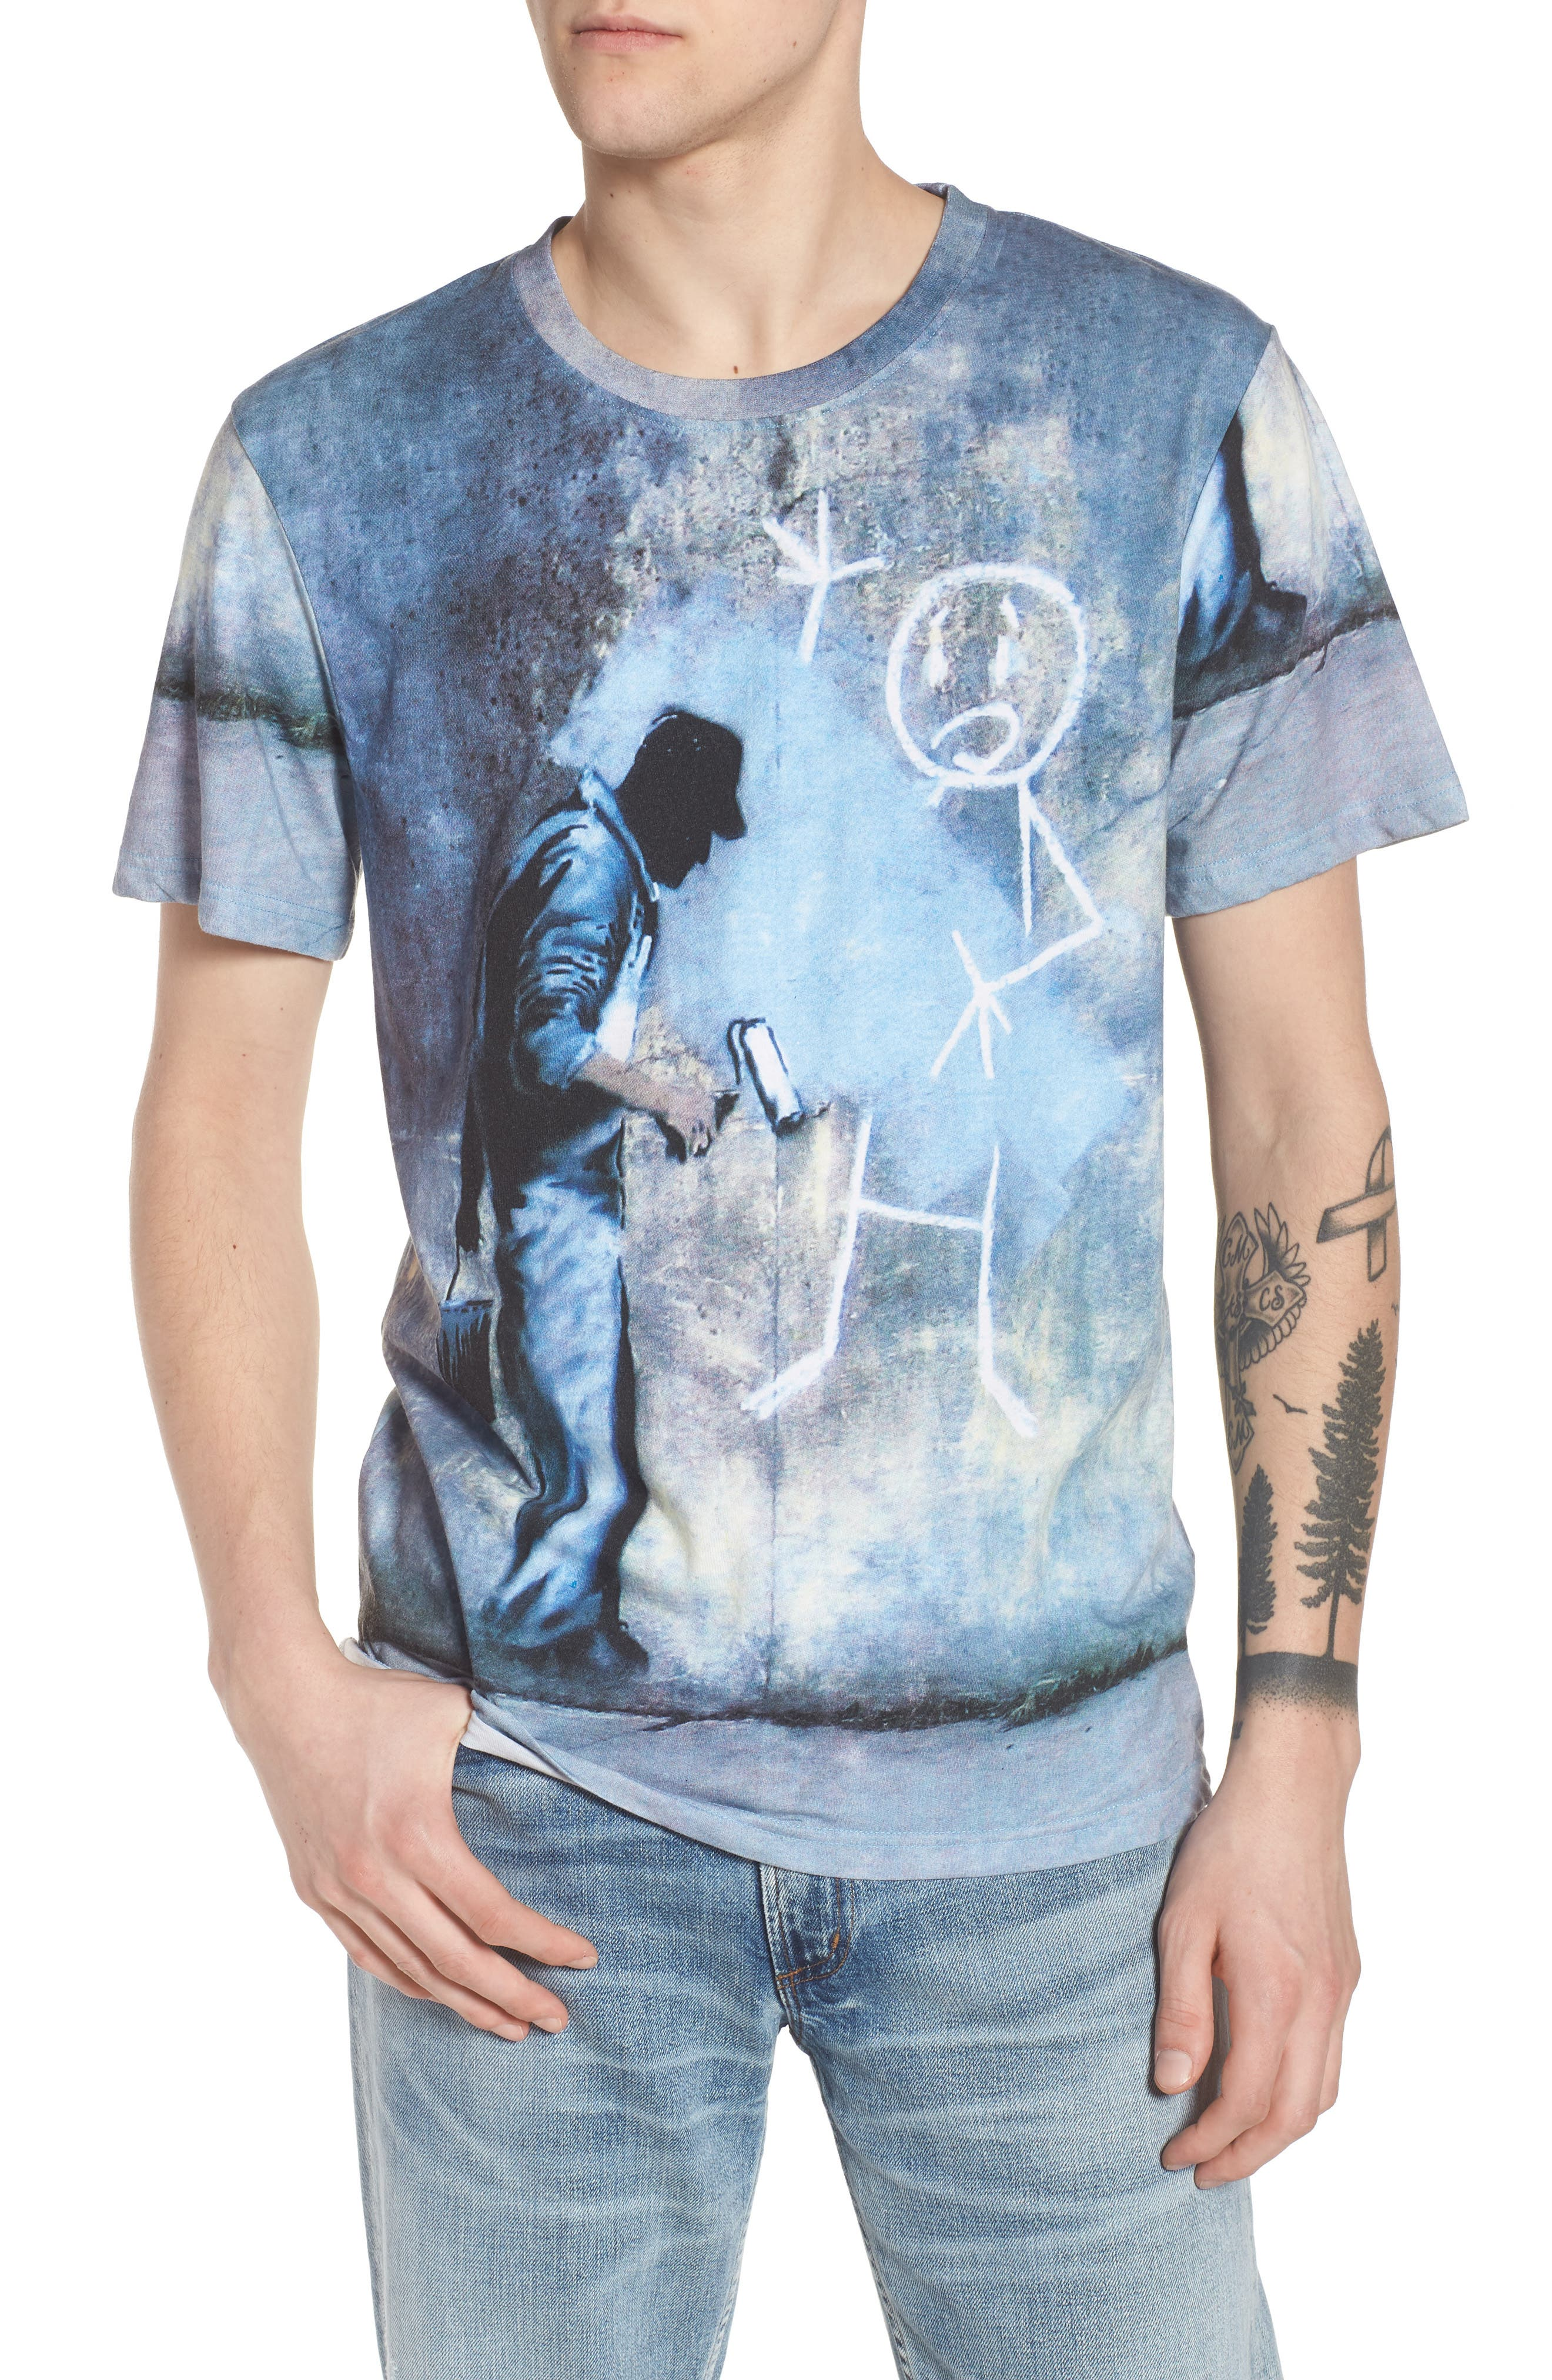 Grey Ghost T-Shirt,                             Main thumbnail 1, color,                             Blue/White